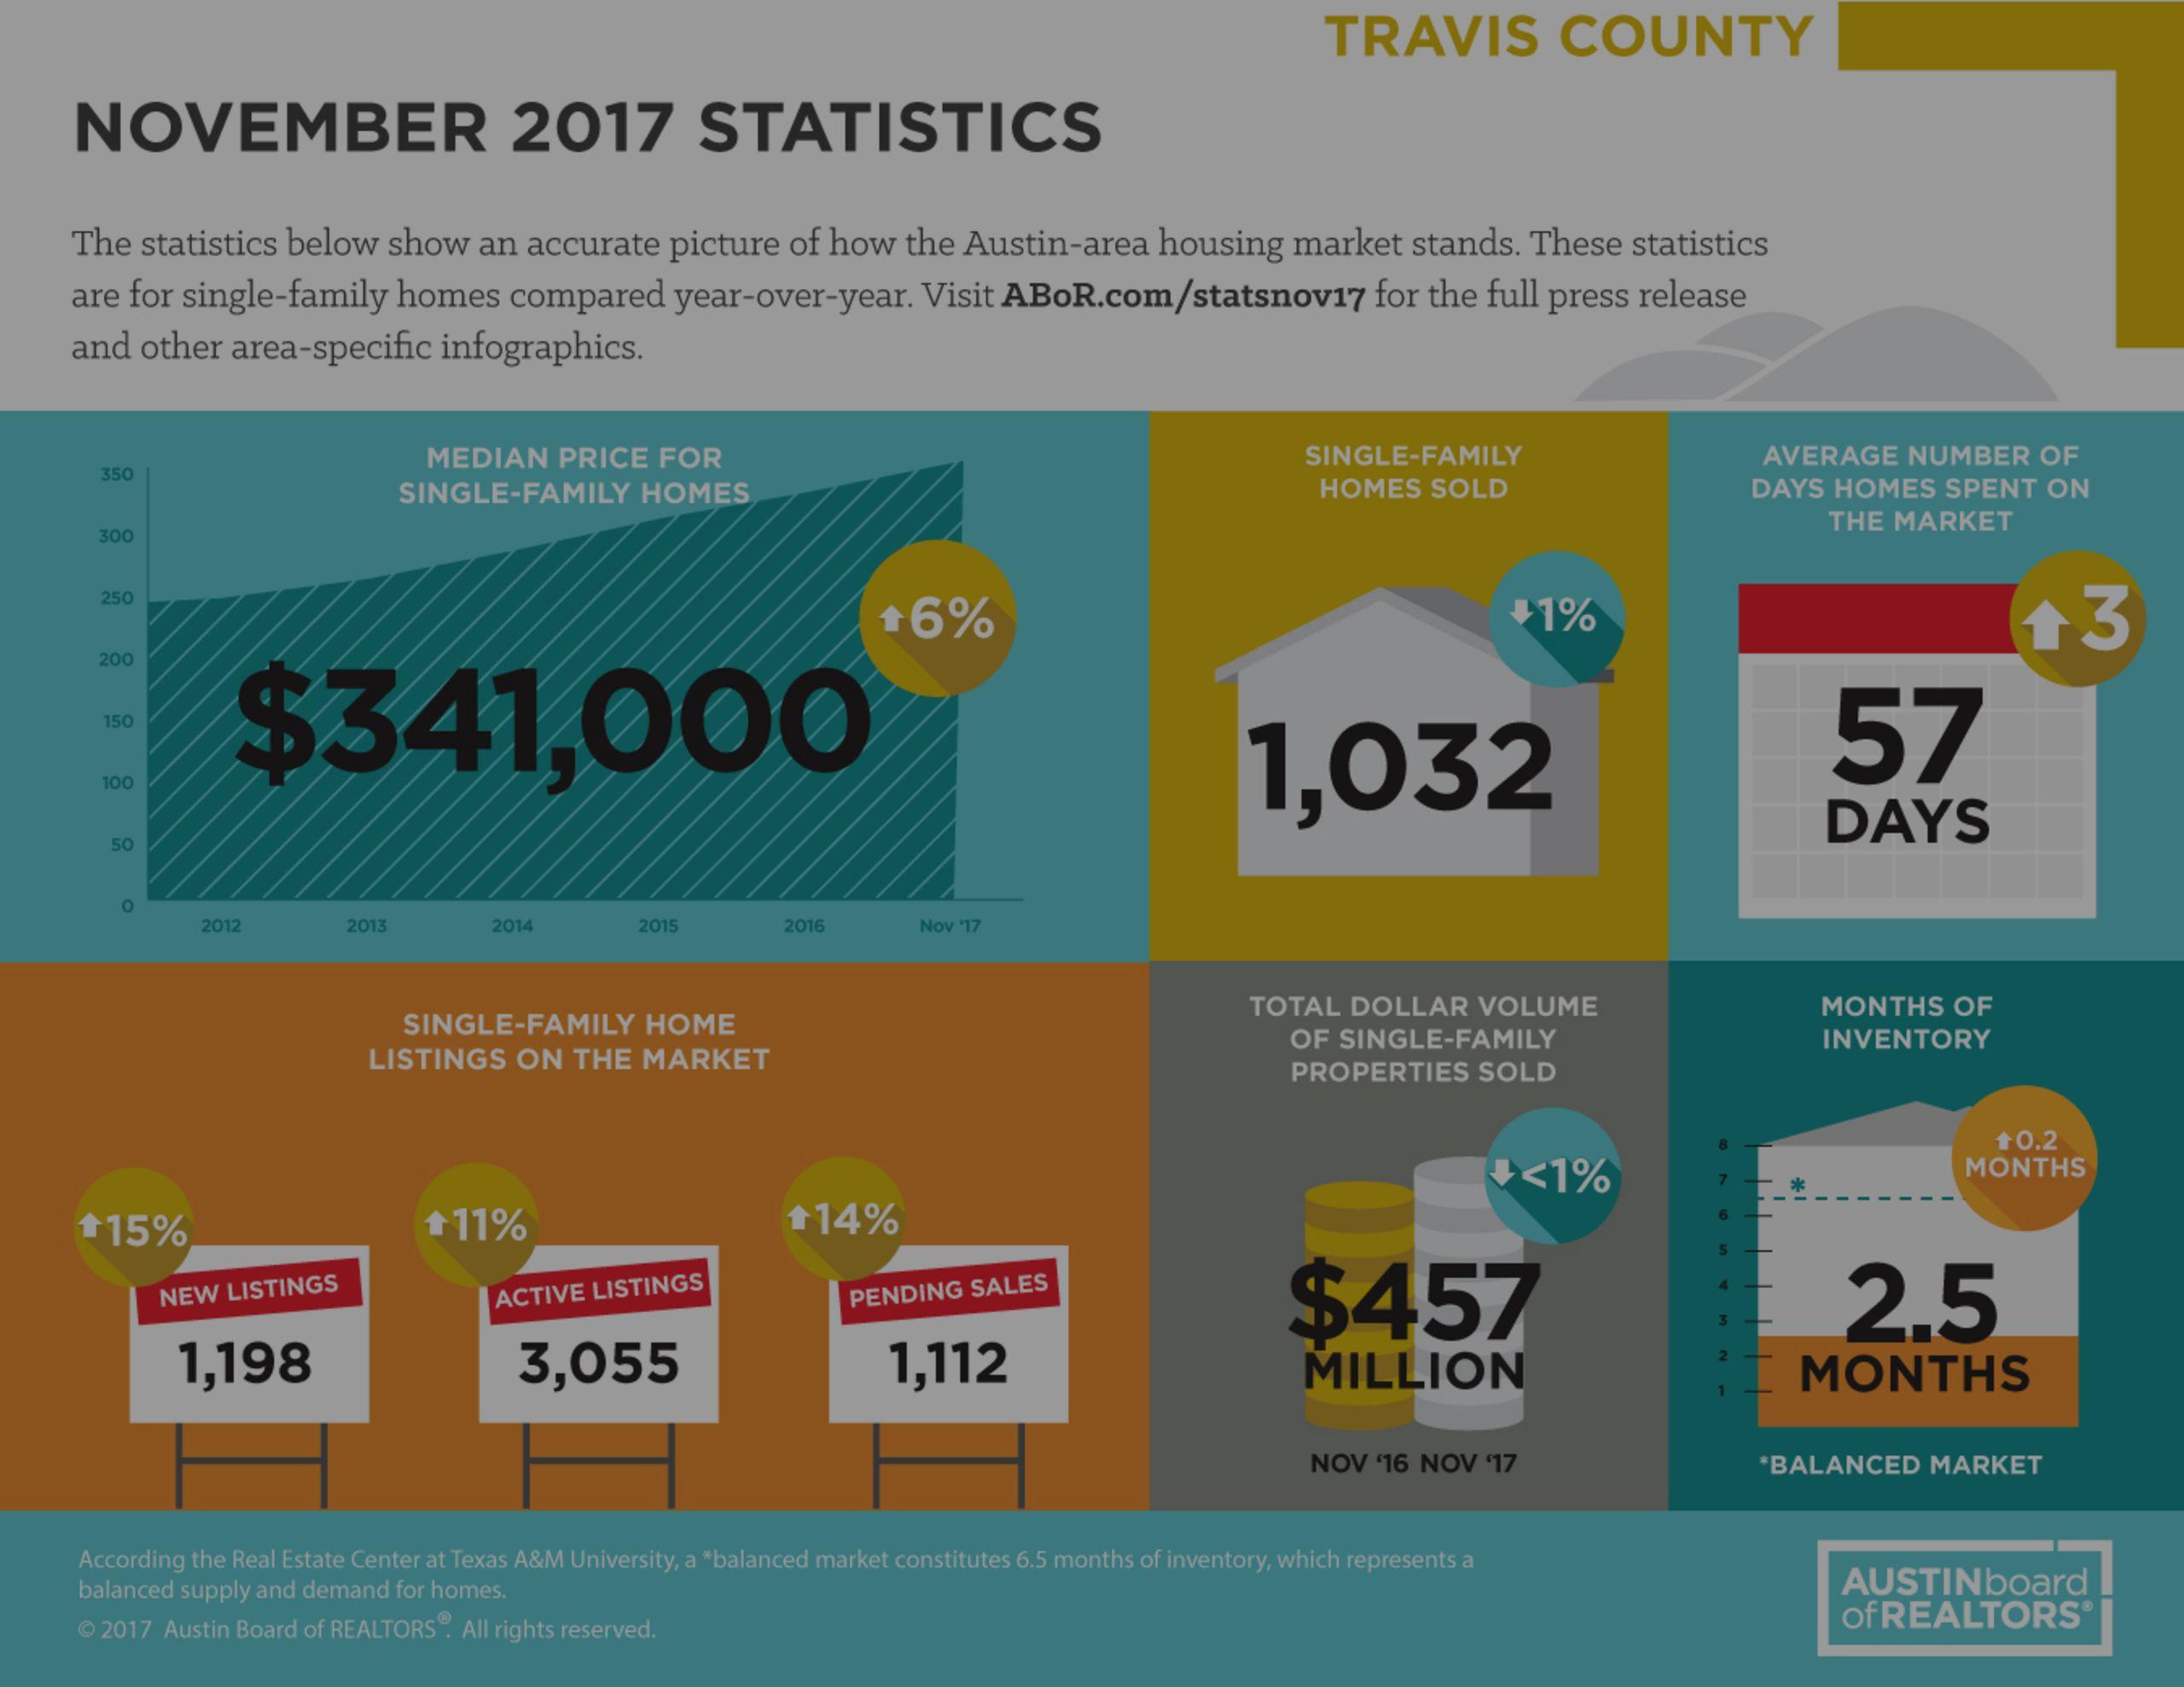 November 2017 Stats